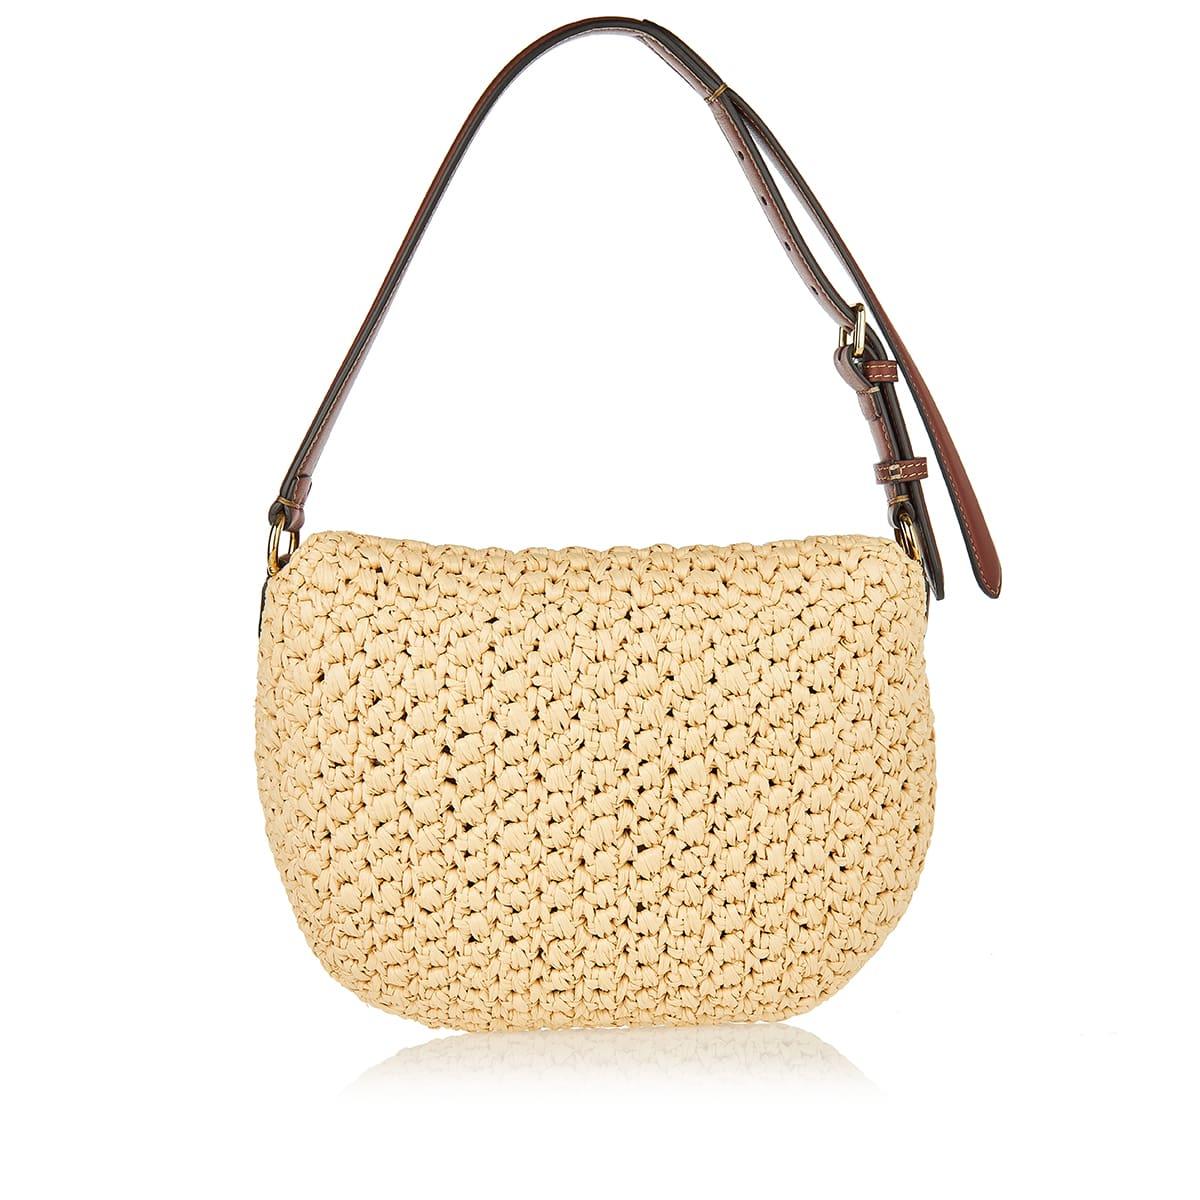 Croissant small straw hobo bag